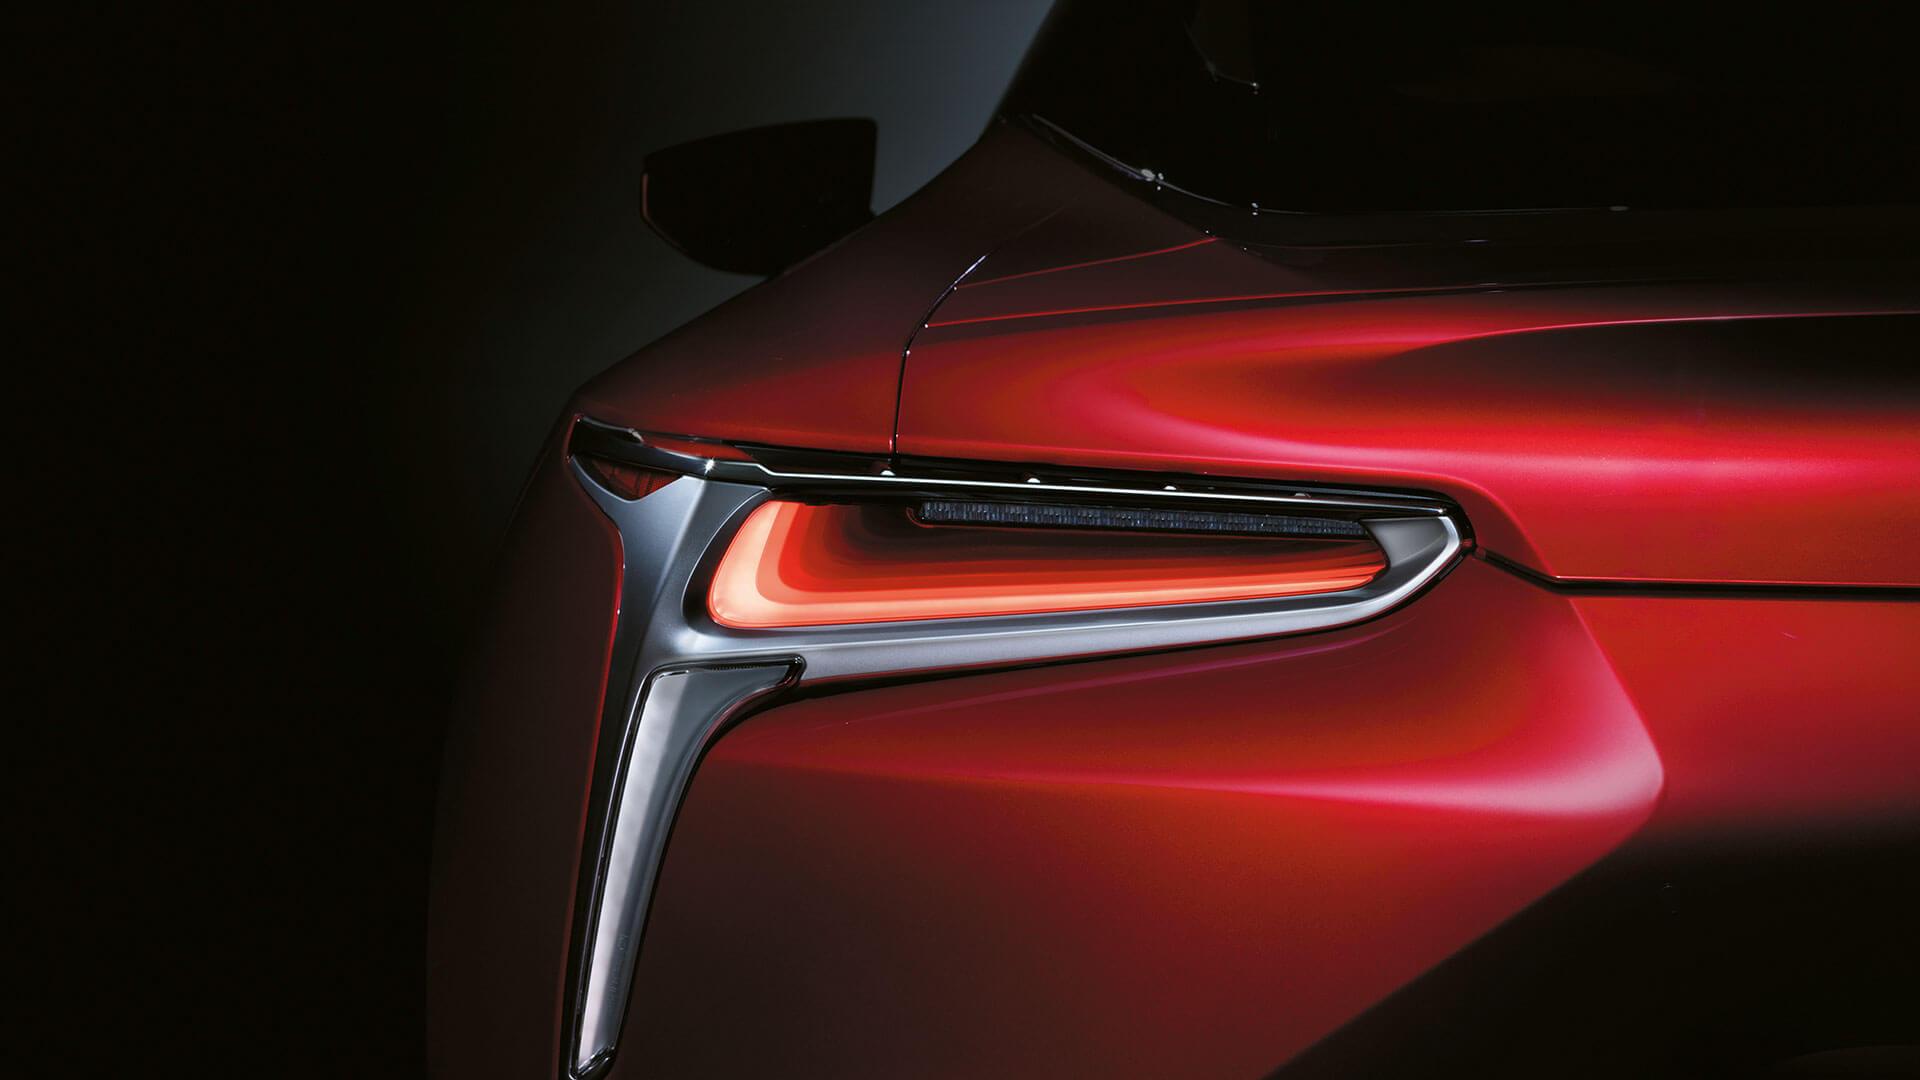 2017 lexus lc 500h features led rear lights